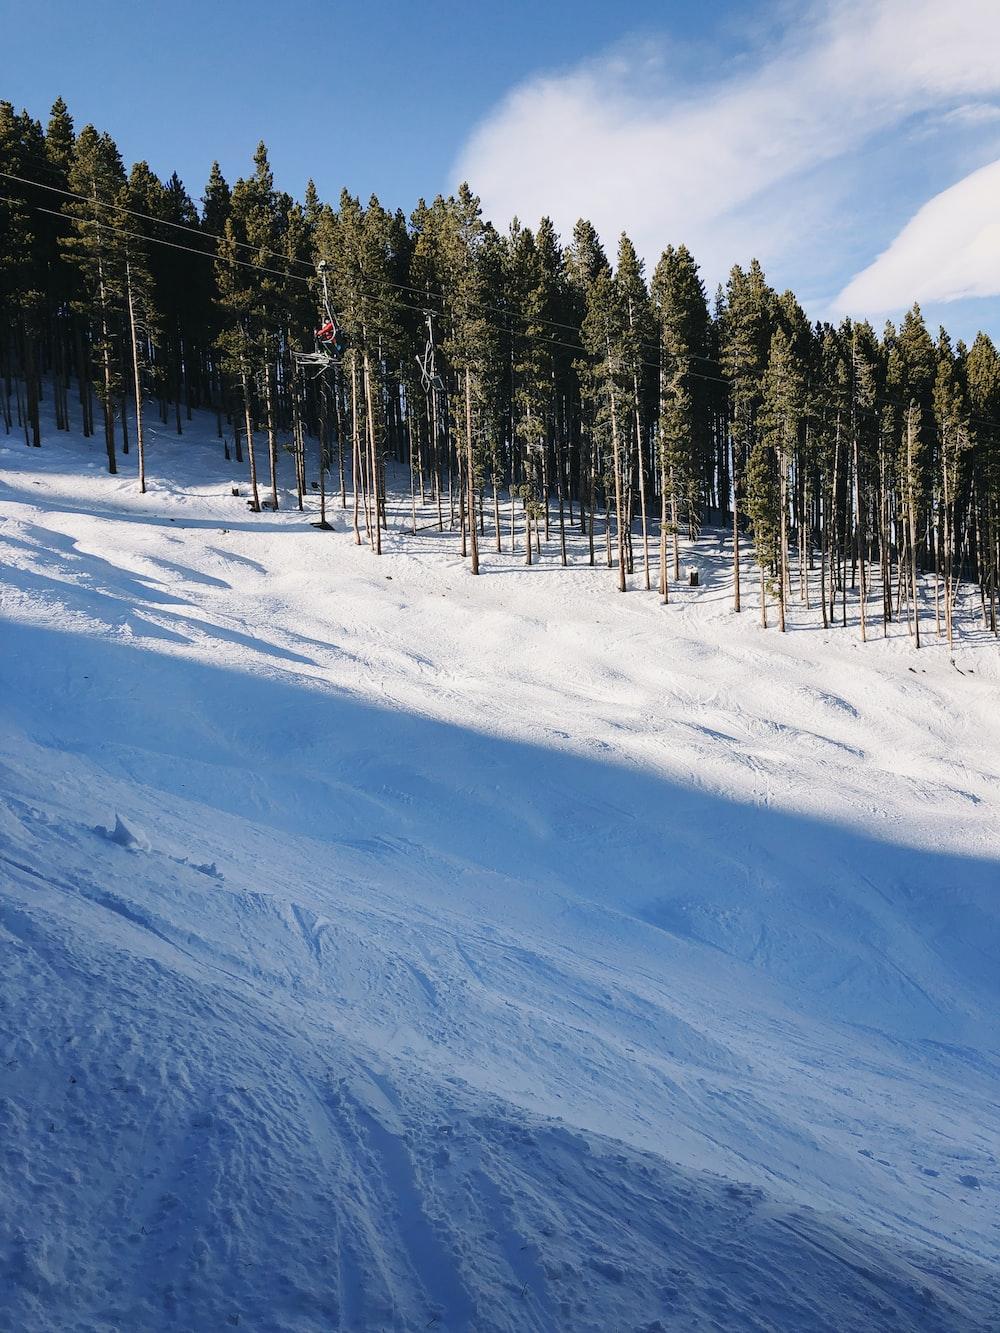 snow covered slope under blue skies